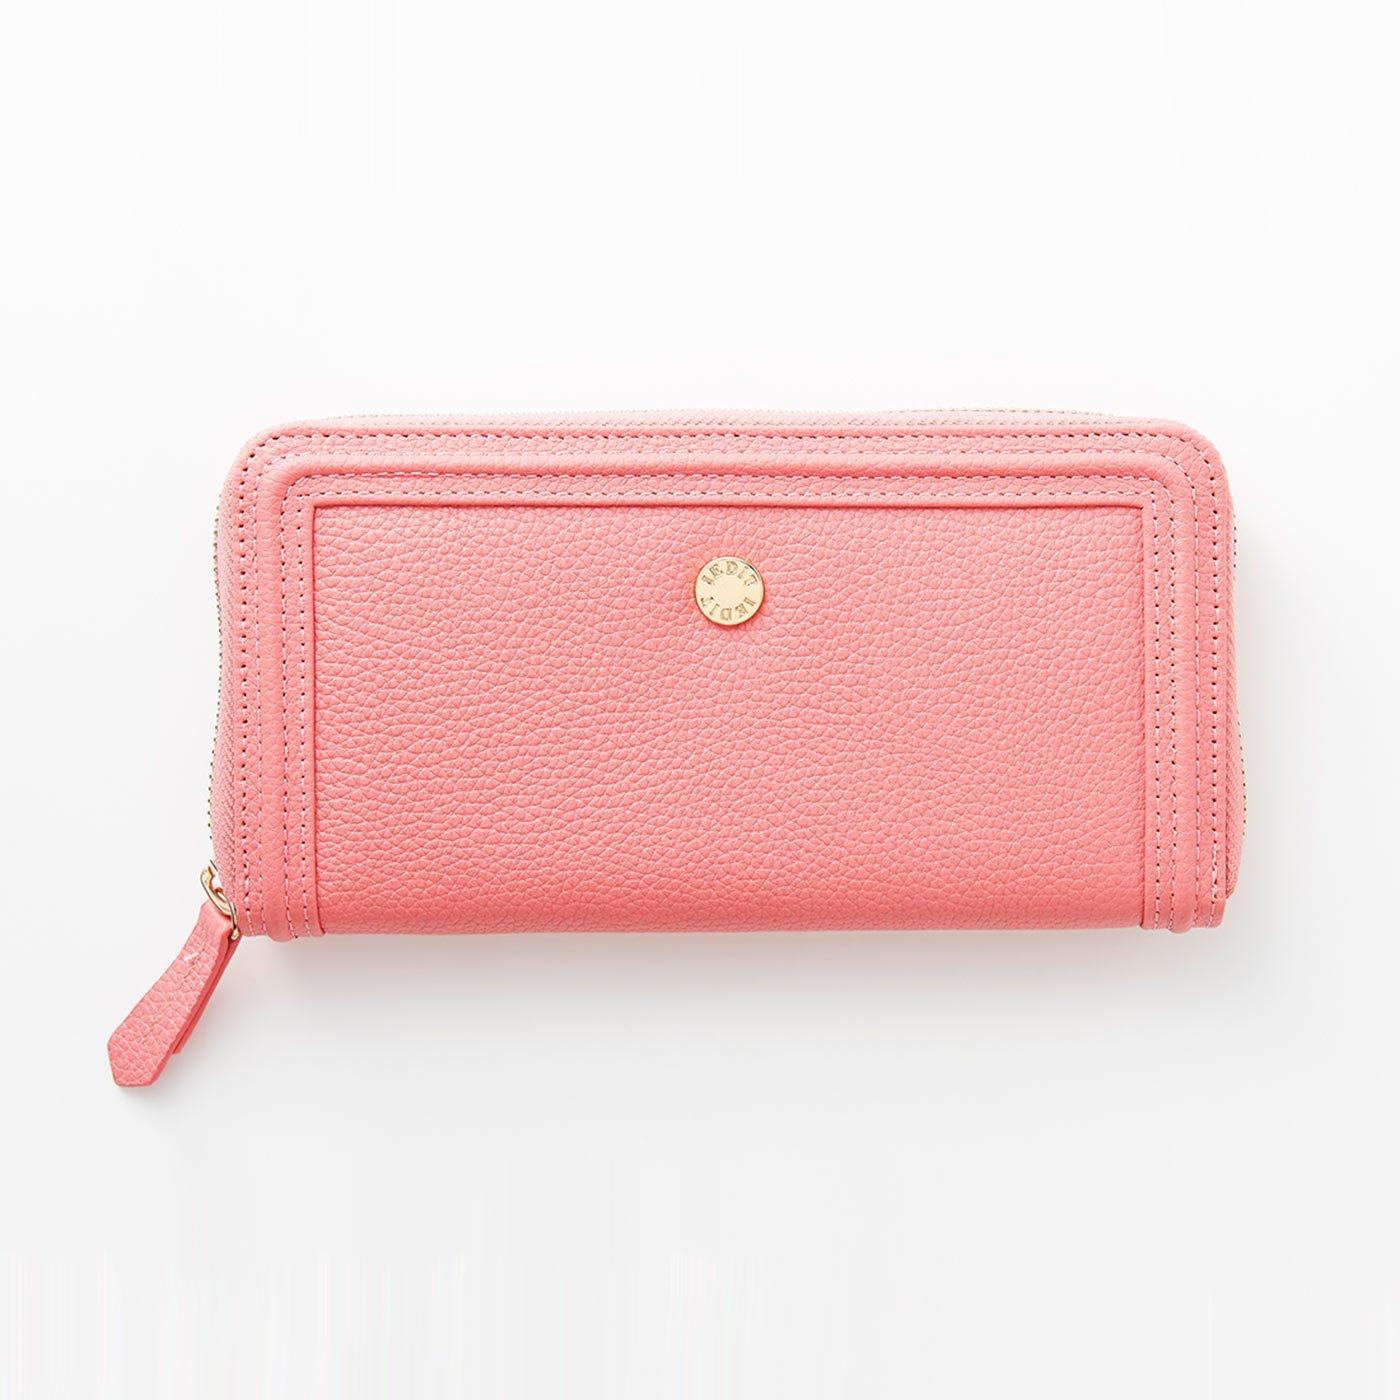 IEDIT[イディット]ワガママ企画 使いやすさをとことん追求 エレガントに映えるローズピンクの本革長財布〈ピンク〉